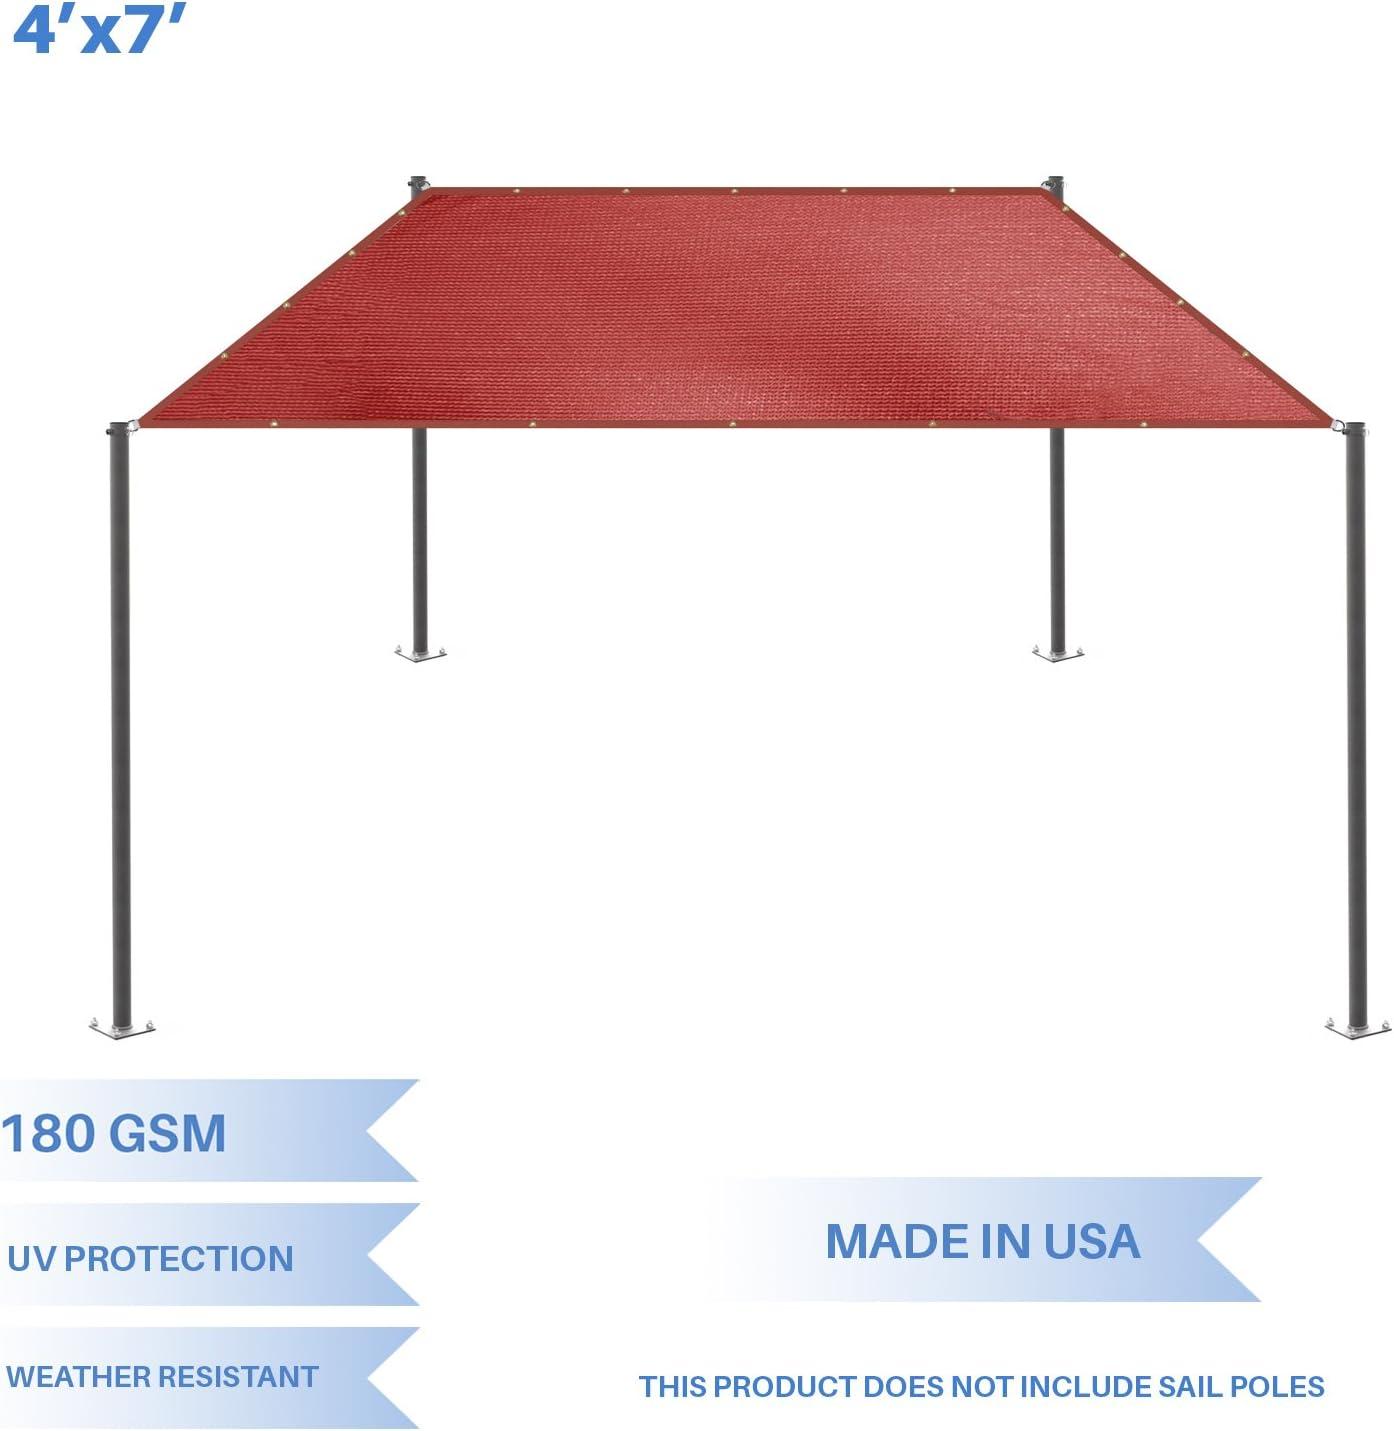 E K Sunrise 4 x 7 Sun Shade Sail- Red Straight Edge Rectangle UV Block Durable Awning Perfect for Canopy Outdoor Garden Backyard-180GSM-Customized